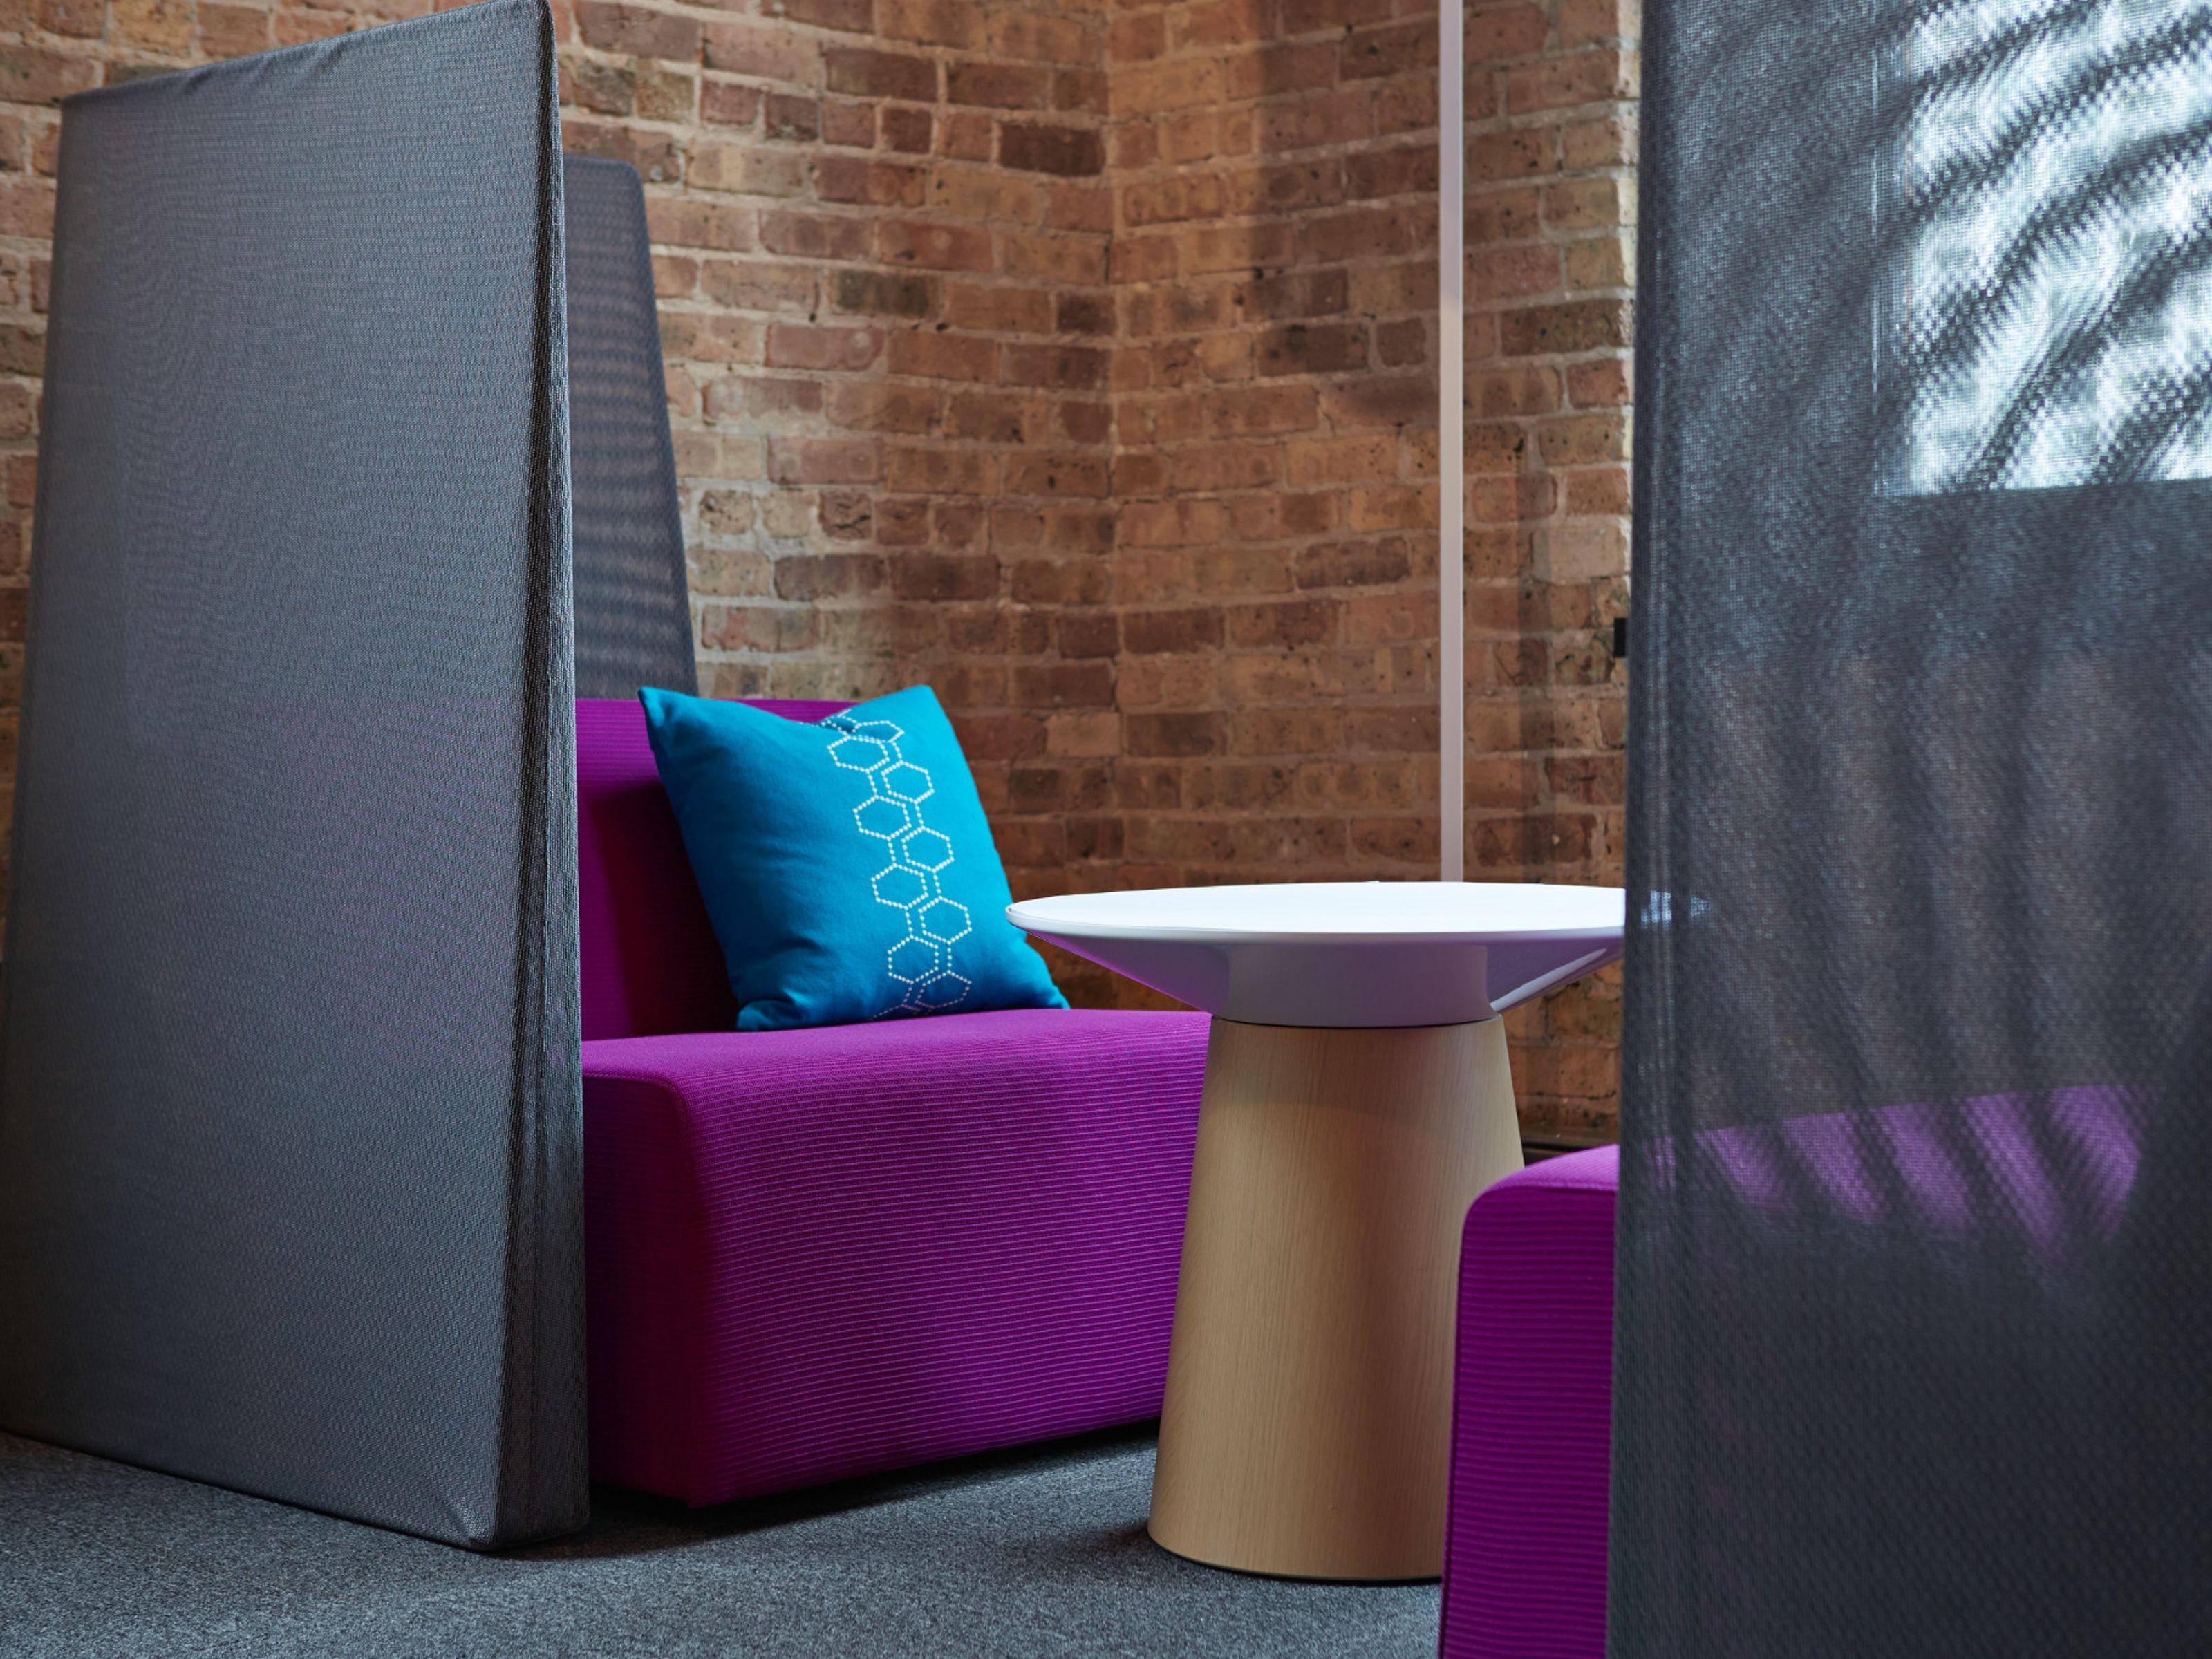 Media Steelcase Furniture, Steelcase furniture, Lounge